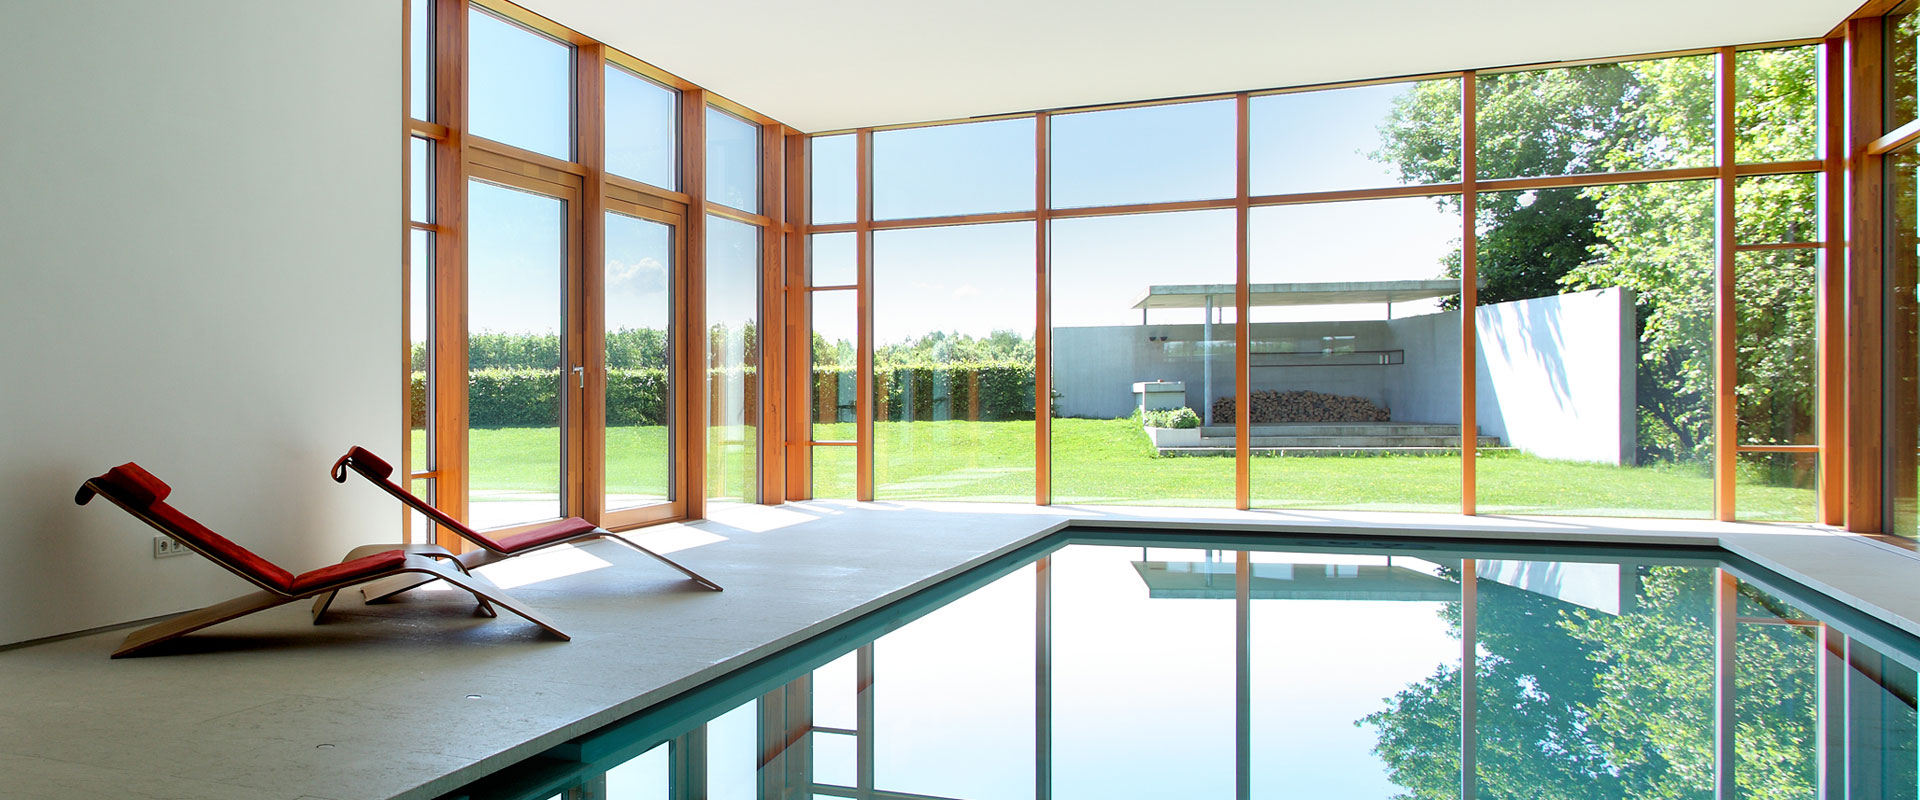 downloads kneer s dfenster fenster und haust ren f r generationen. Black Bedroom Furniture Sets. Home Design Ideas